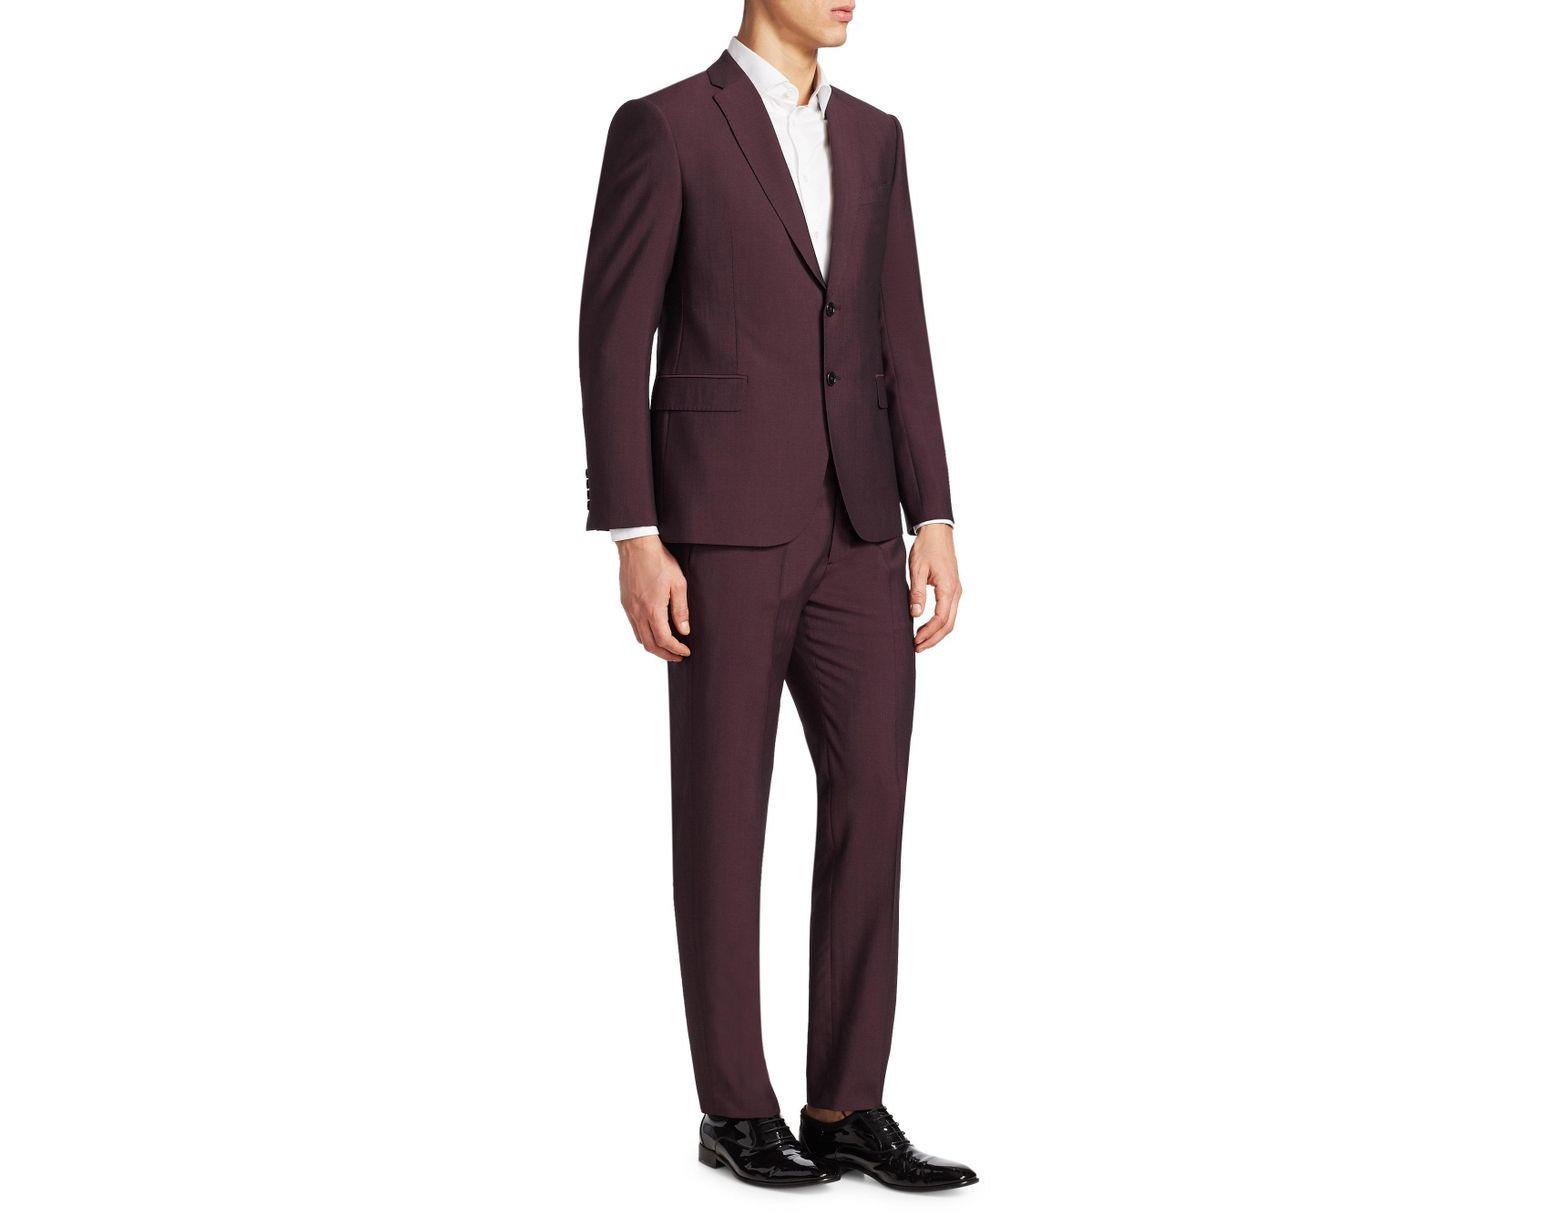 dc594abafafe3 Emporio Armani Merlot Mohair-blend Suit in Purple for Men - Lyst